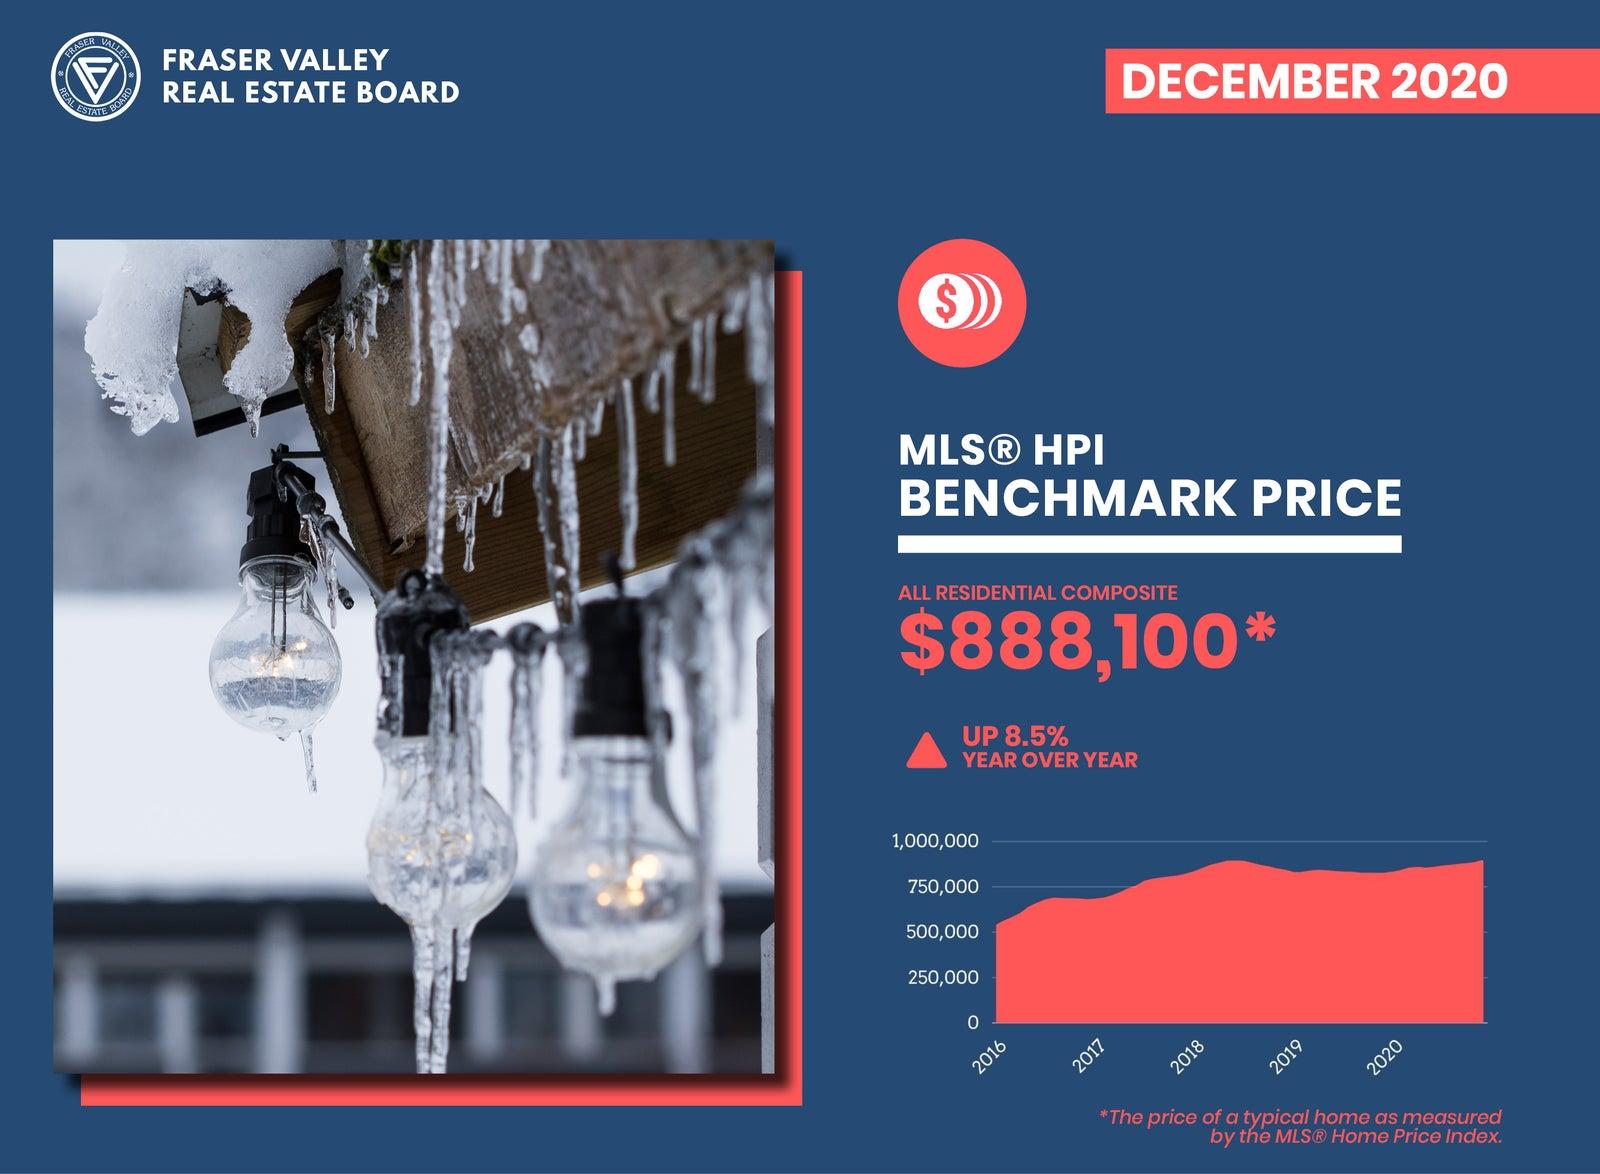 Benchmark Price - All Residential FVREB December 2020